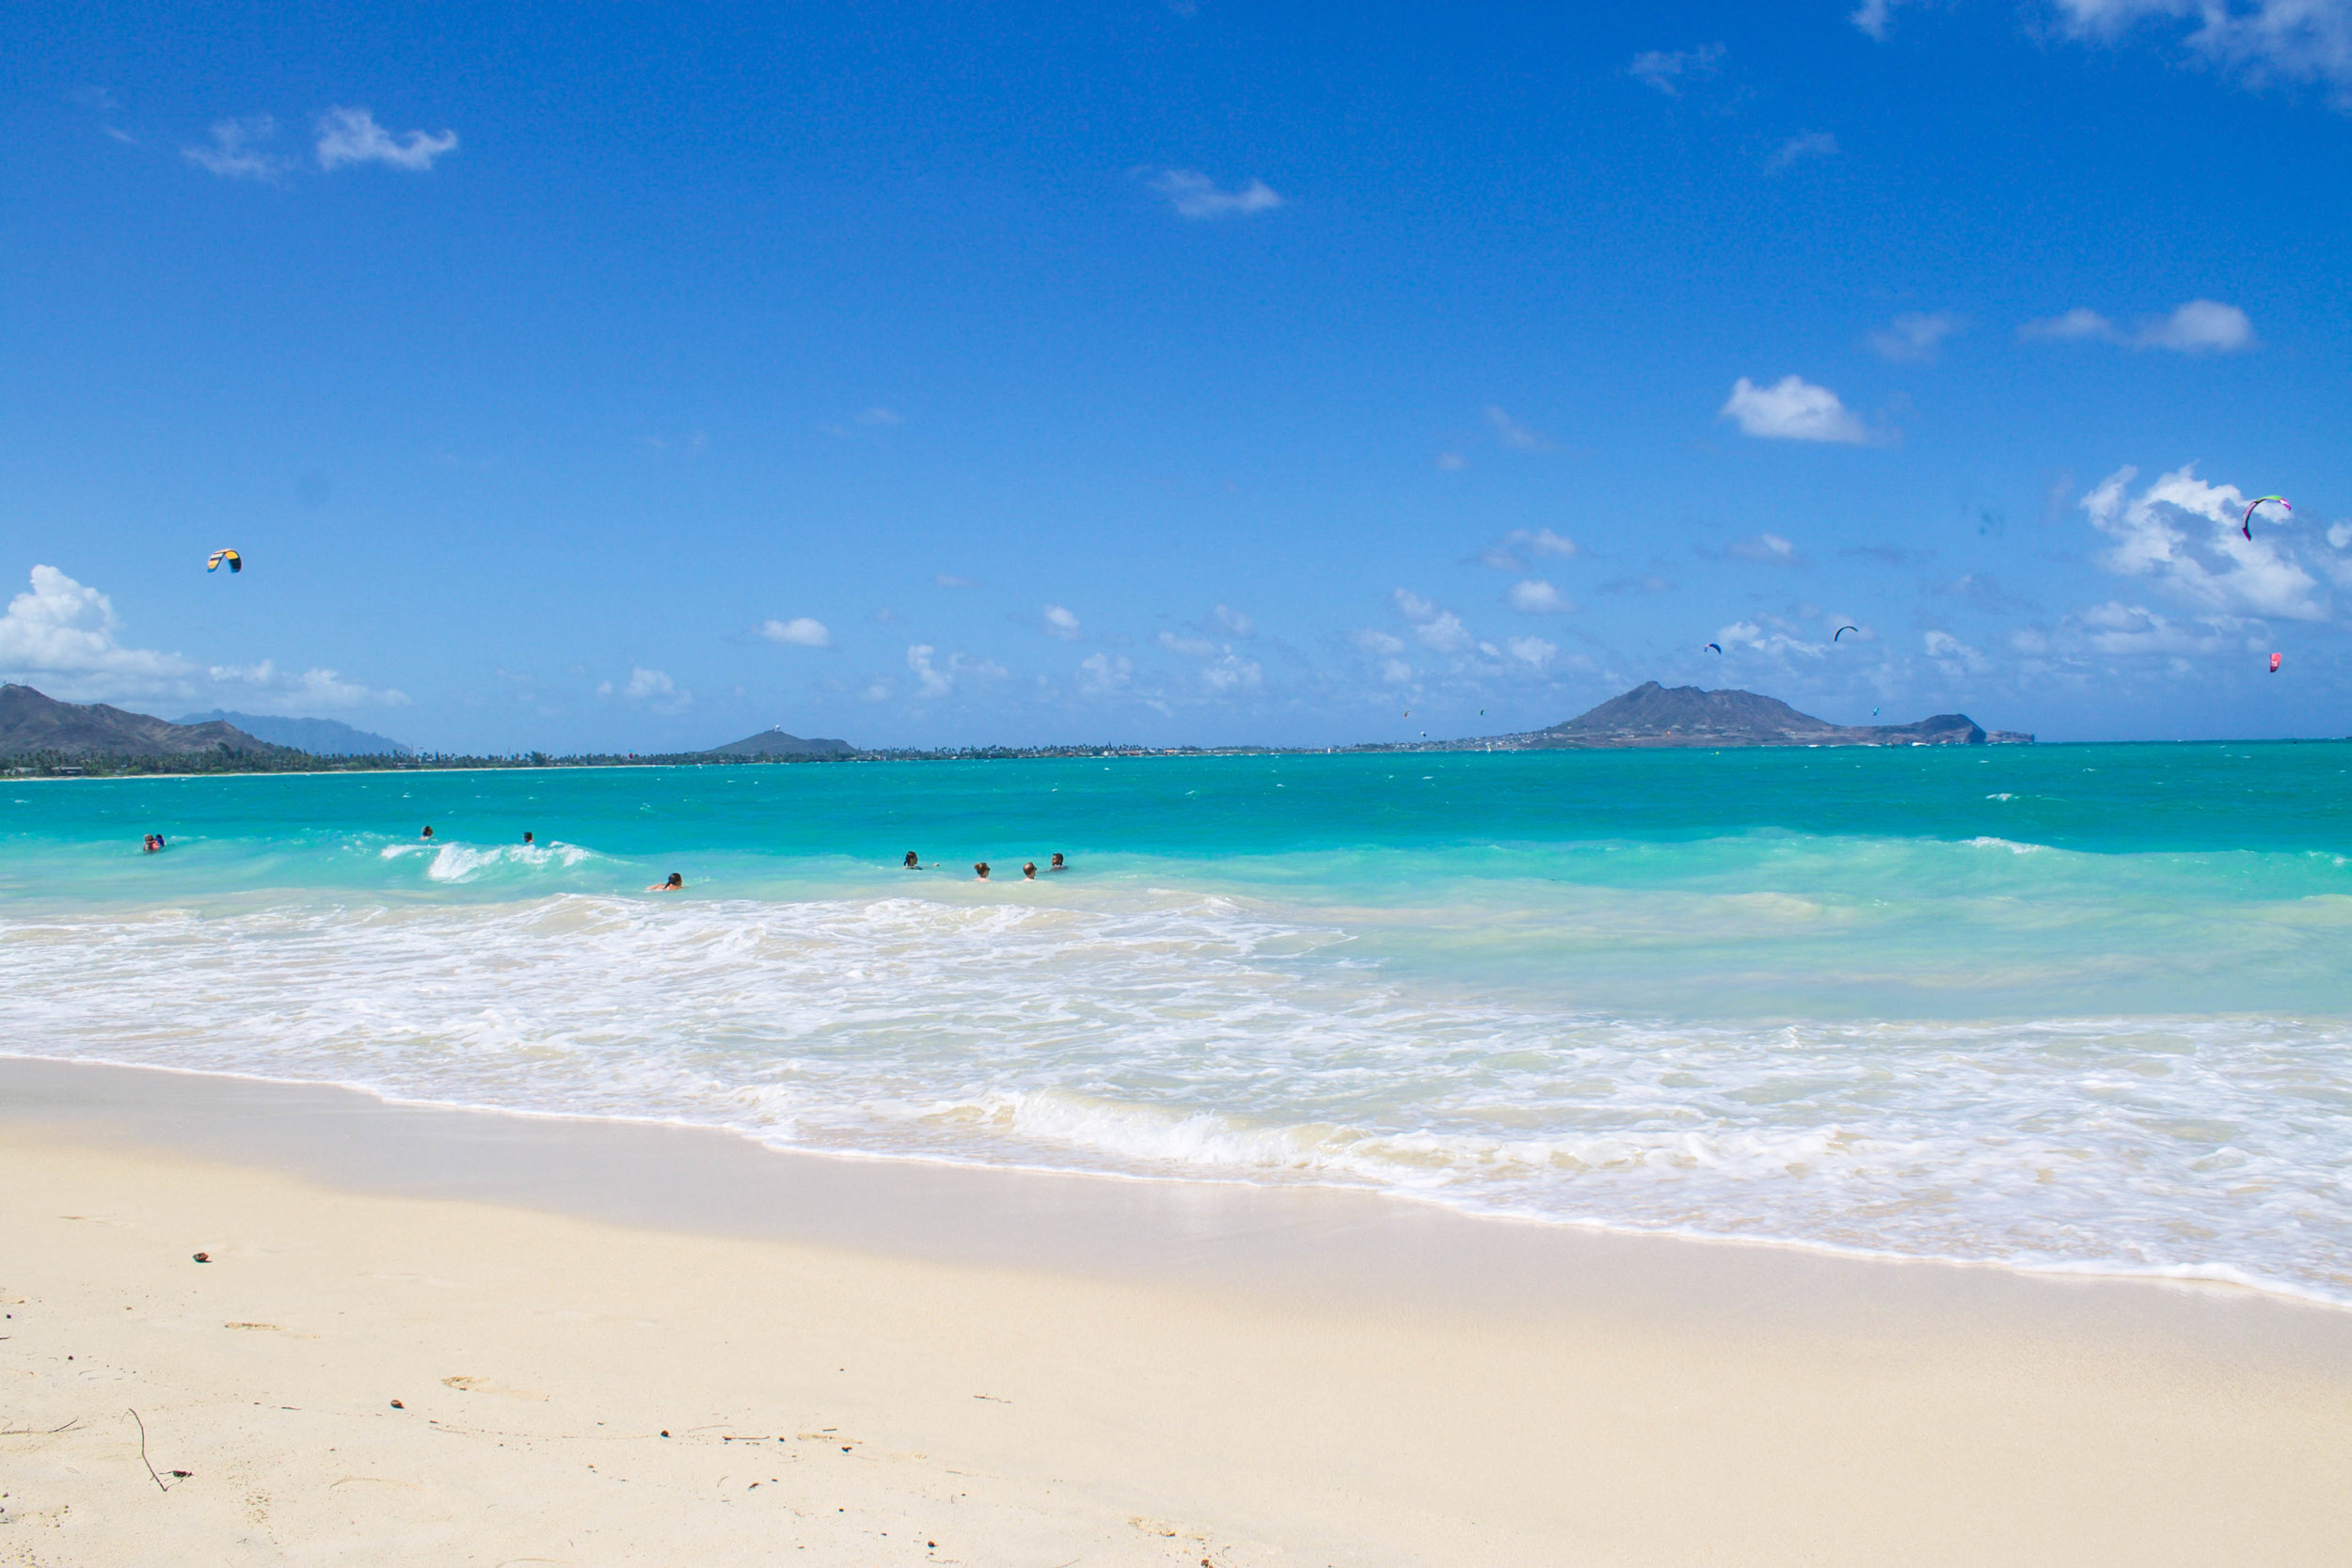 kailua-beach.jpg